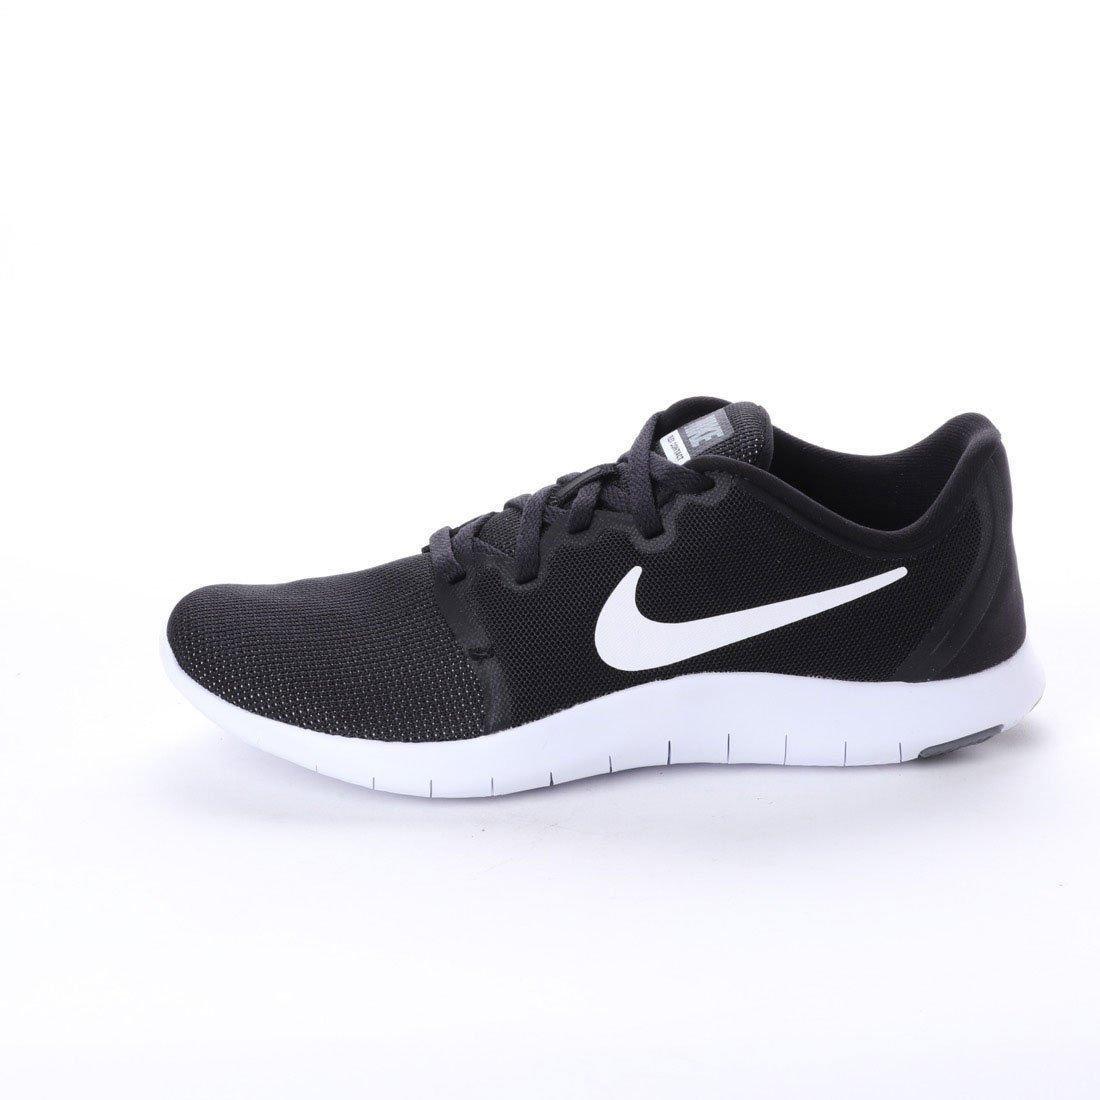 Nike Damen WMNS Flex Contact 2 Turnschuhe